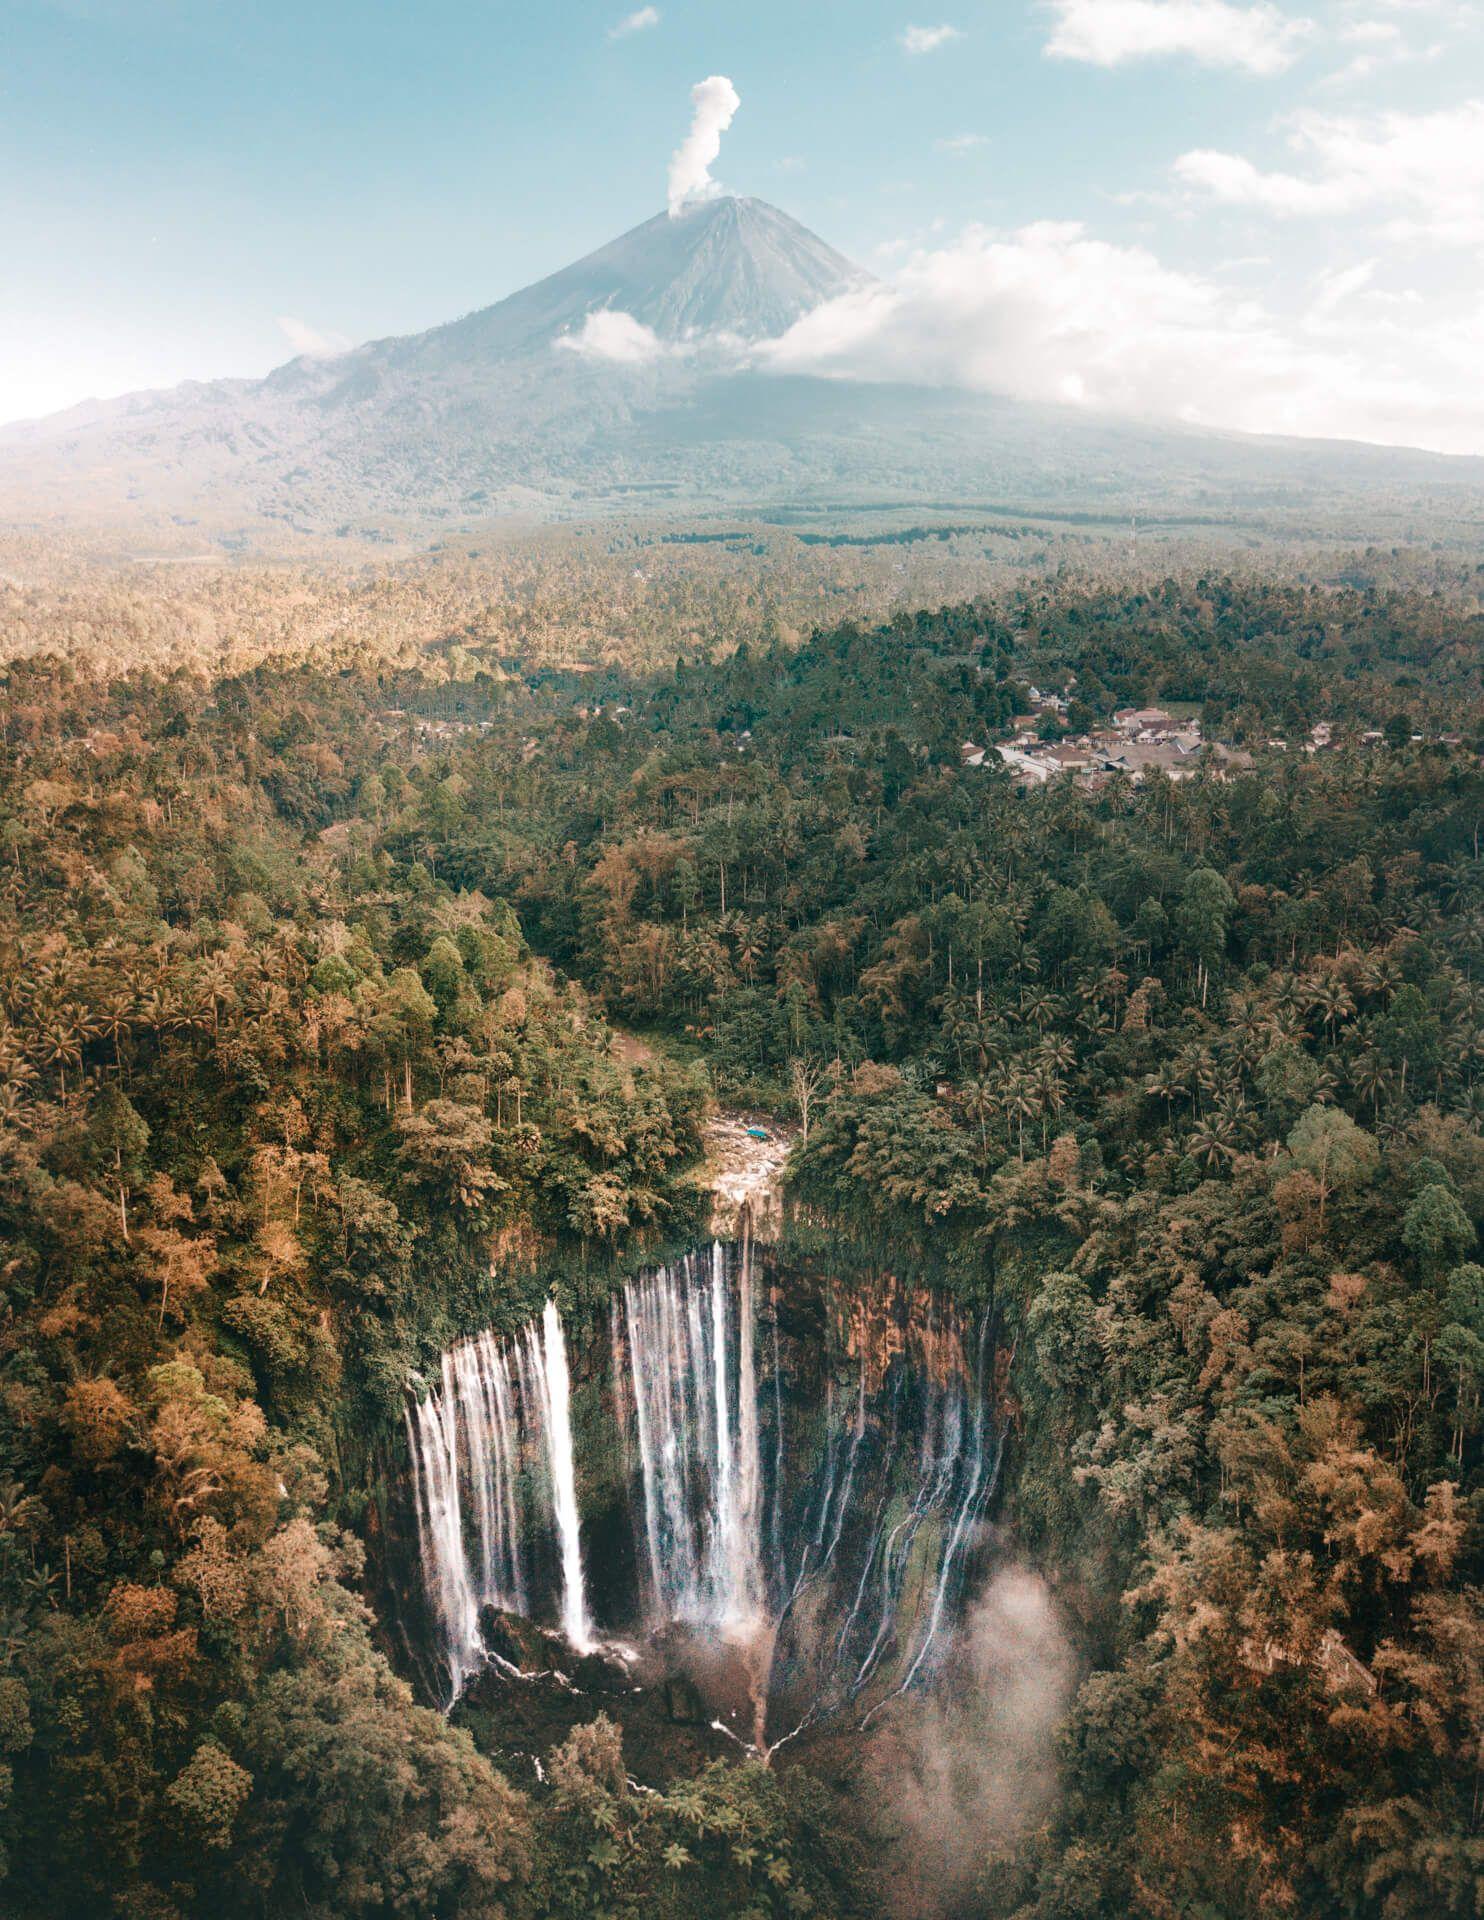 Best Waterfall in Indonesia – Tumpak Sewu Waterfall